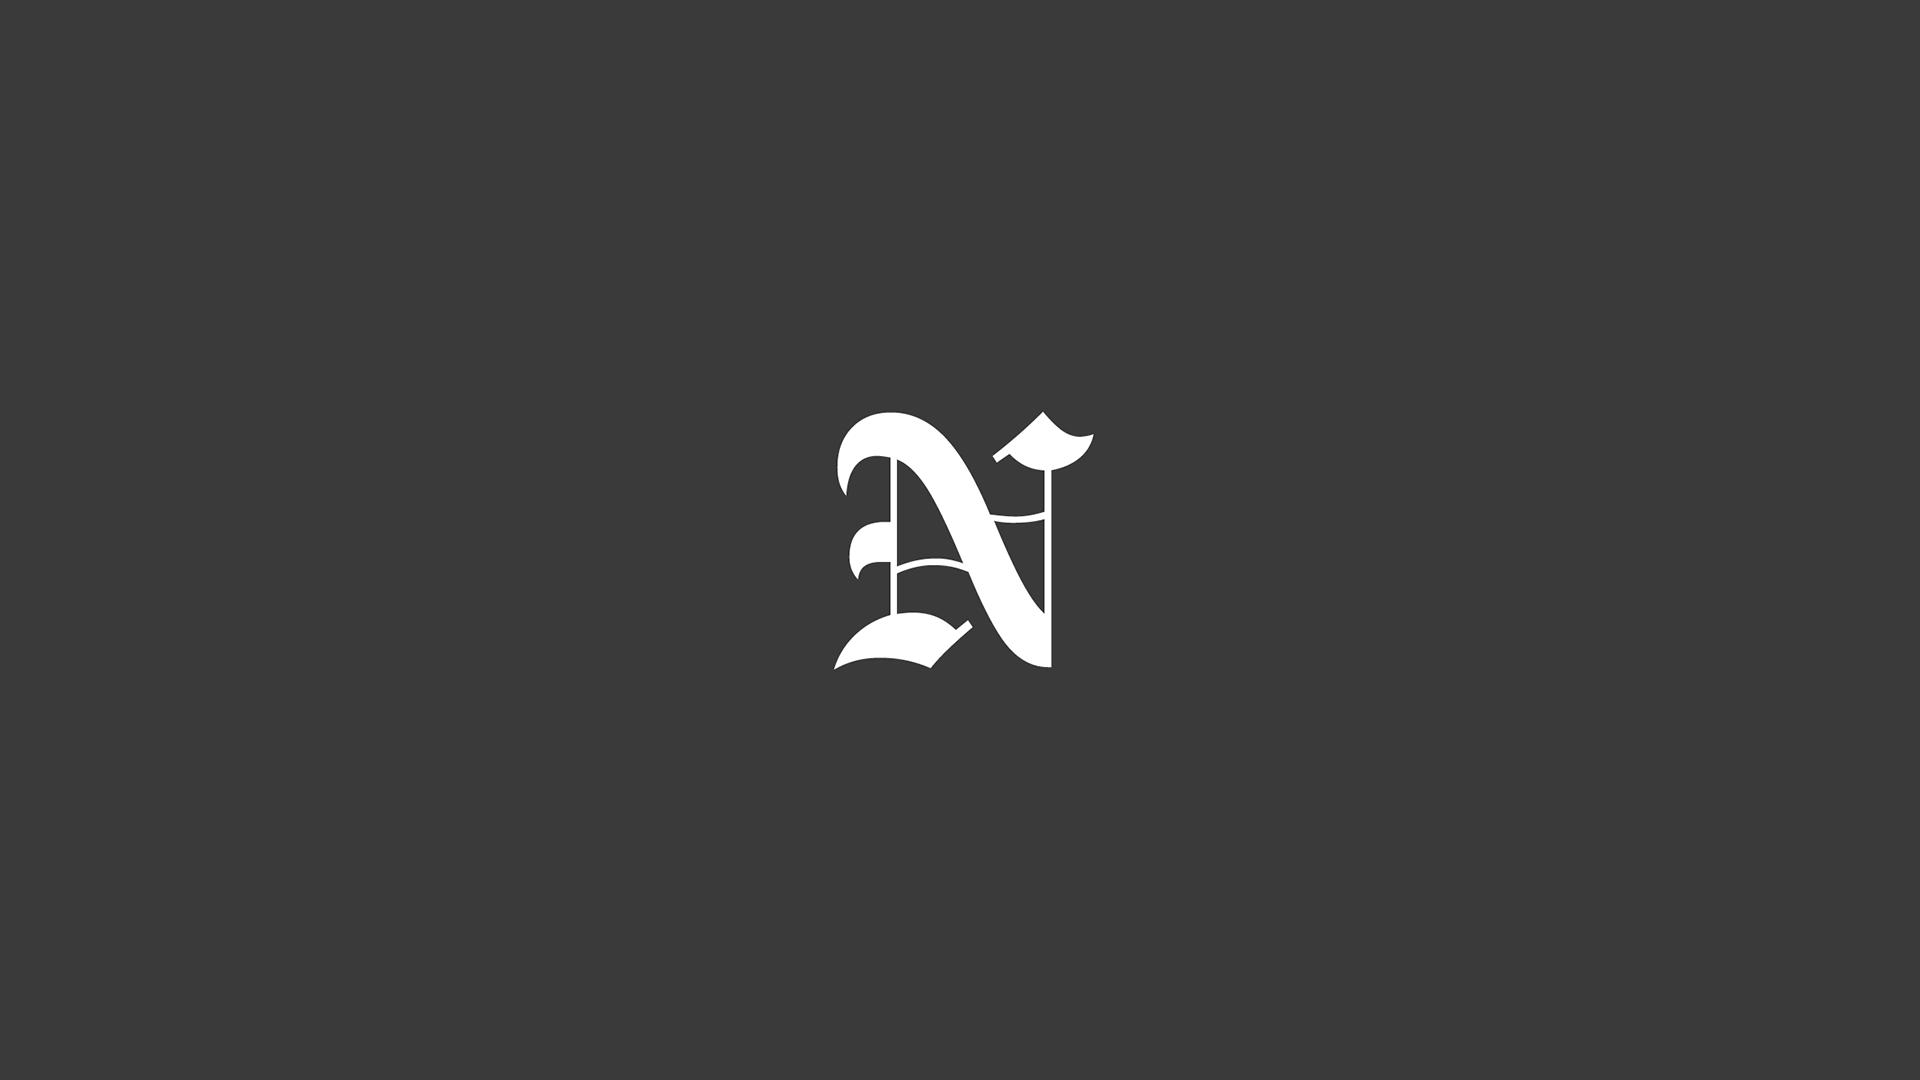 N Name Logo Wallpaper N, HD Logo, 4k Wallpap...